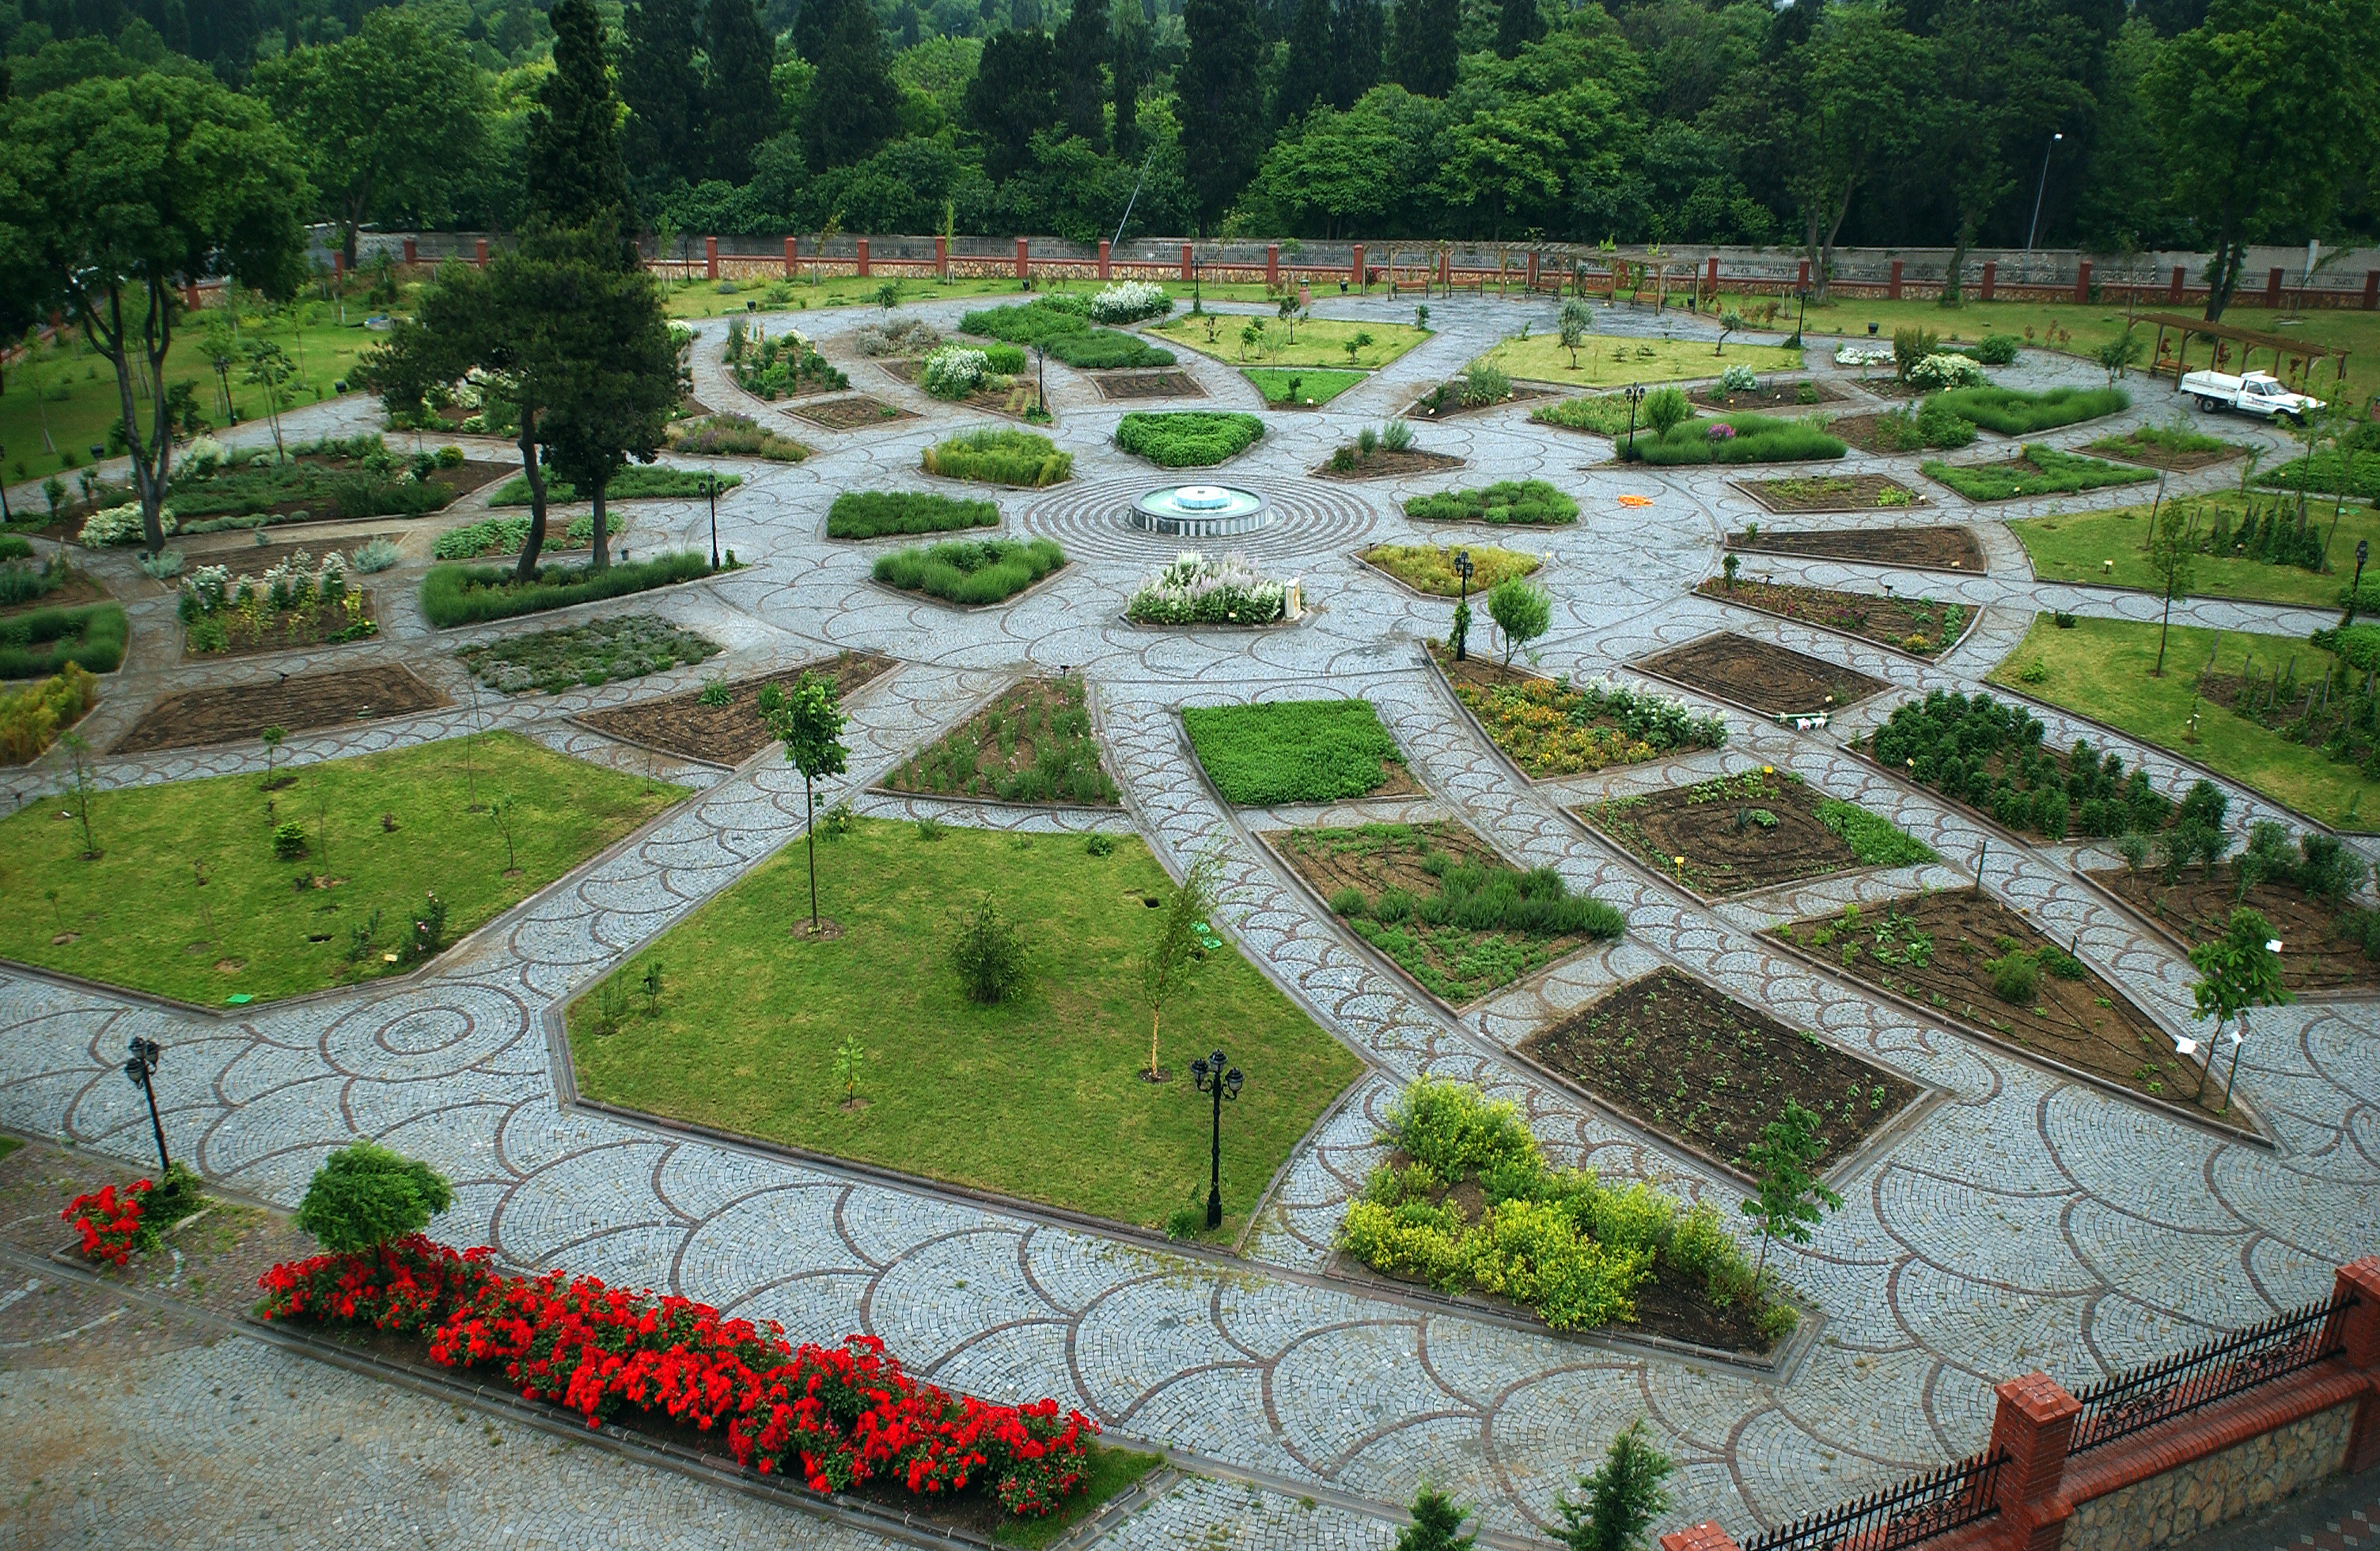 Zeytinburnu Medicinal Plant Garden